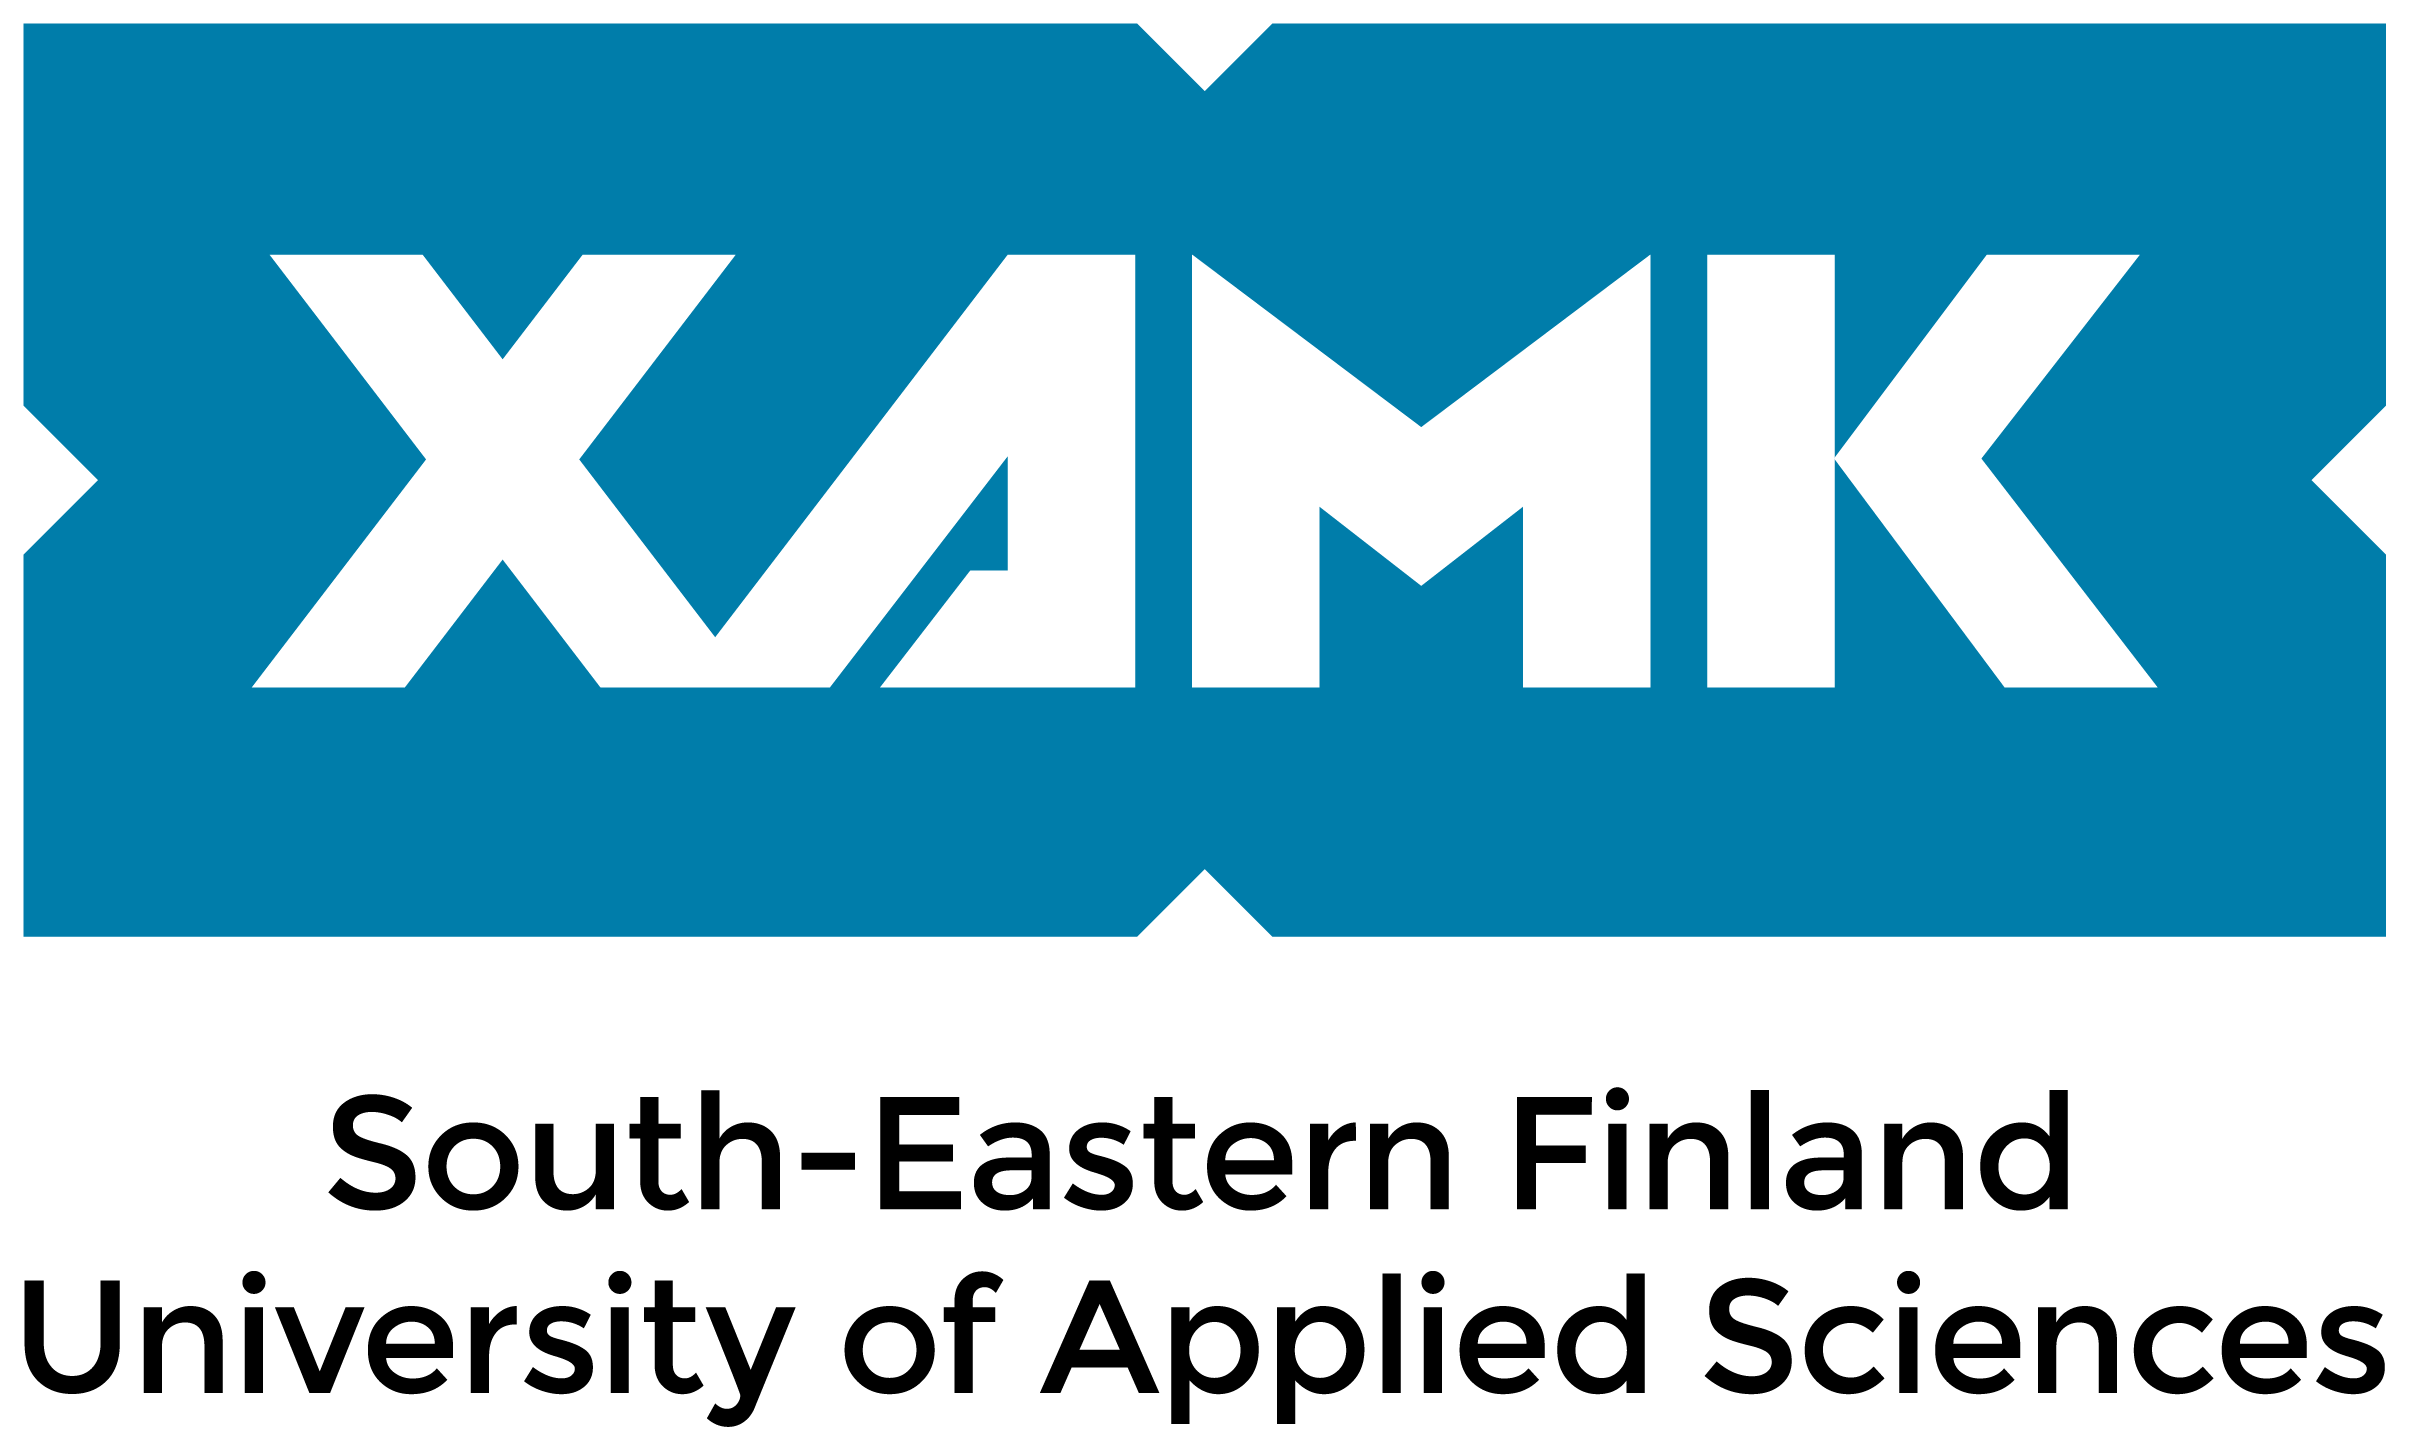 Logo of XAMK South-Eastern Finland University of Applied Sciences